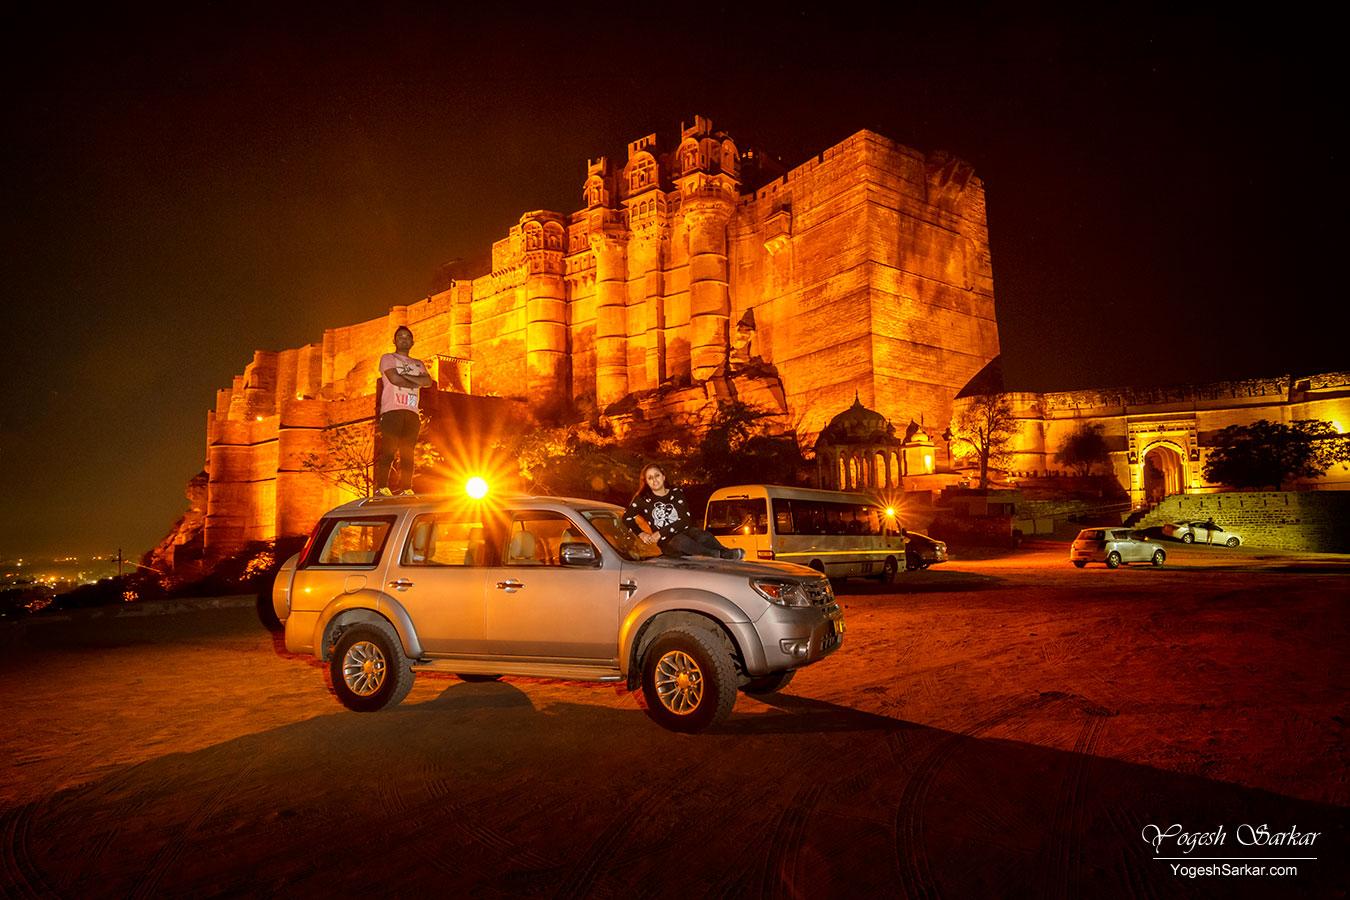 mehrangarh-fort-night-illuminated.jpg